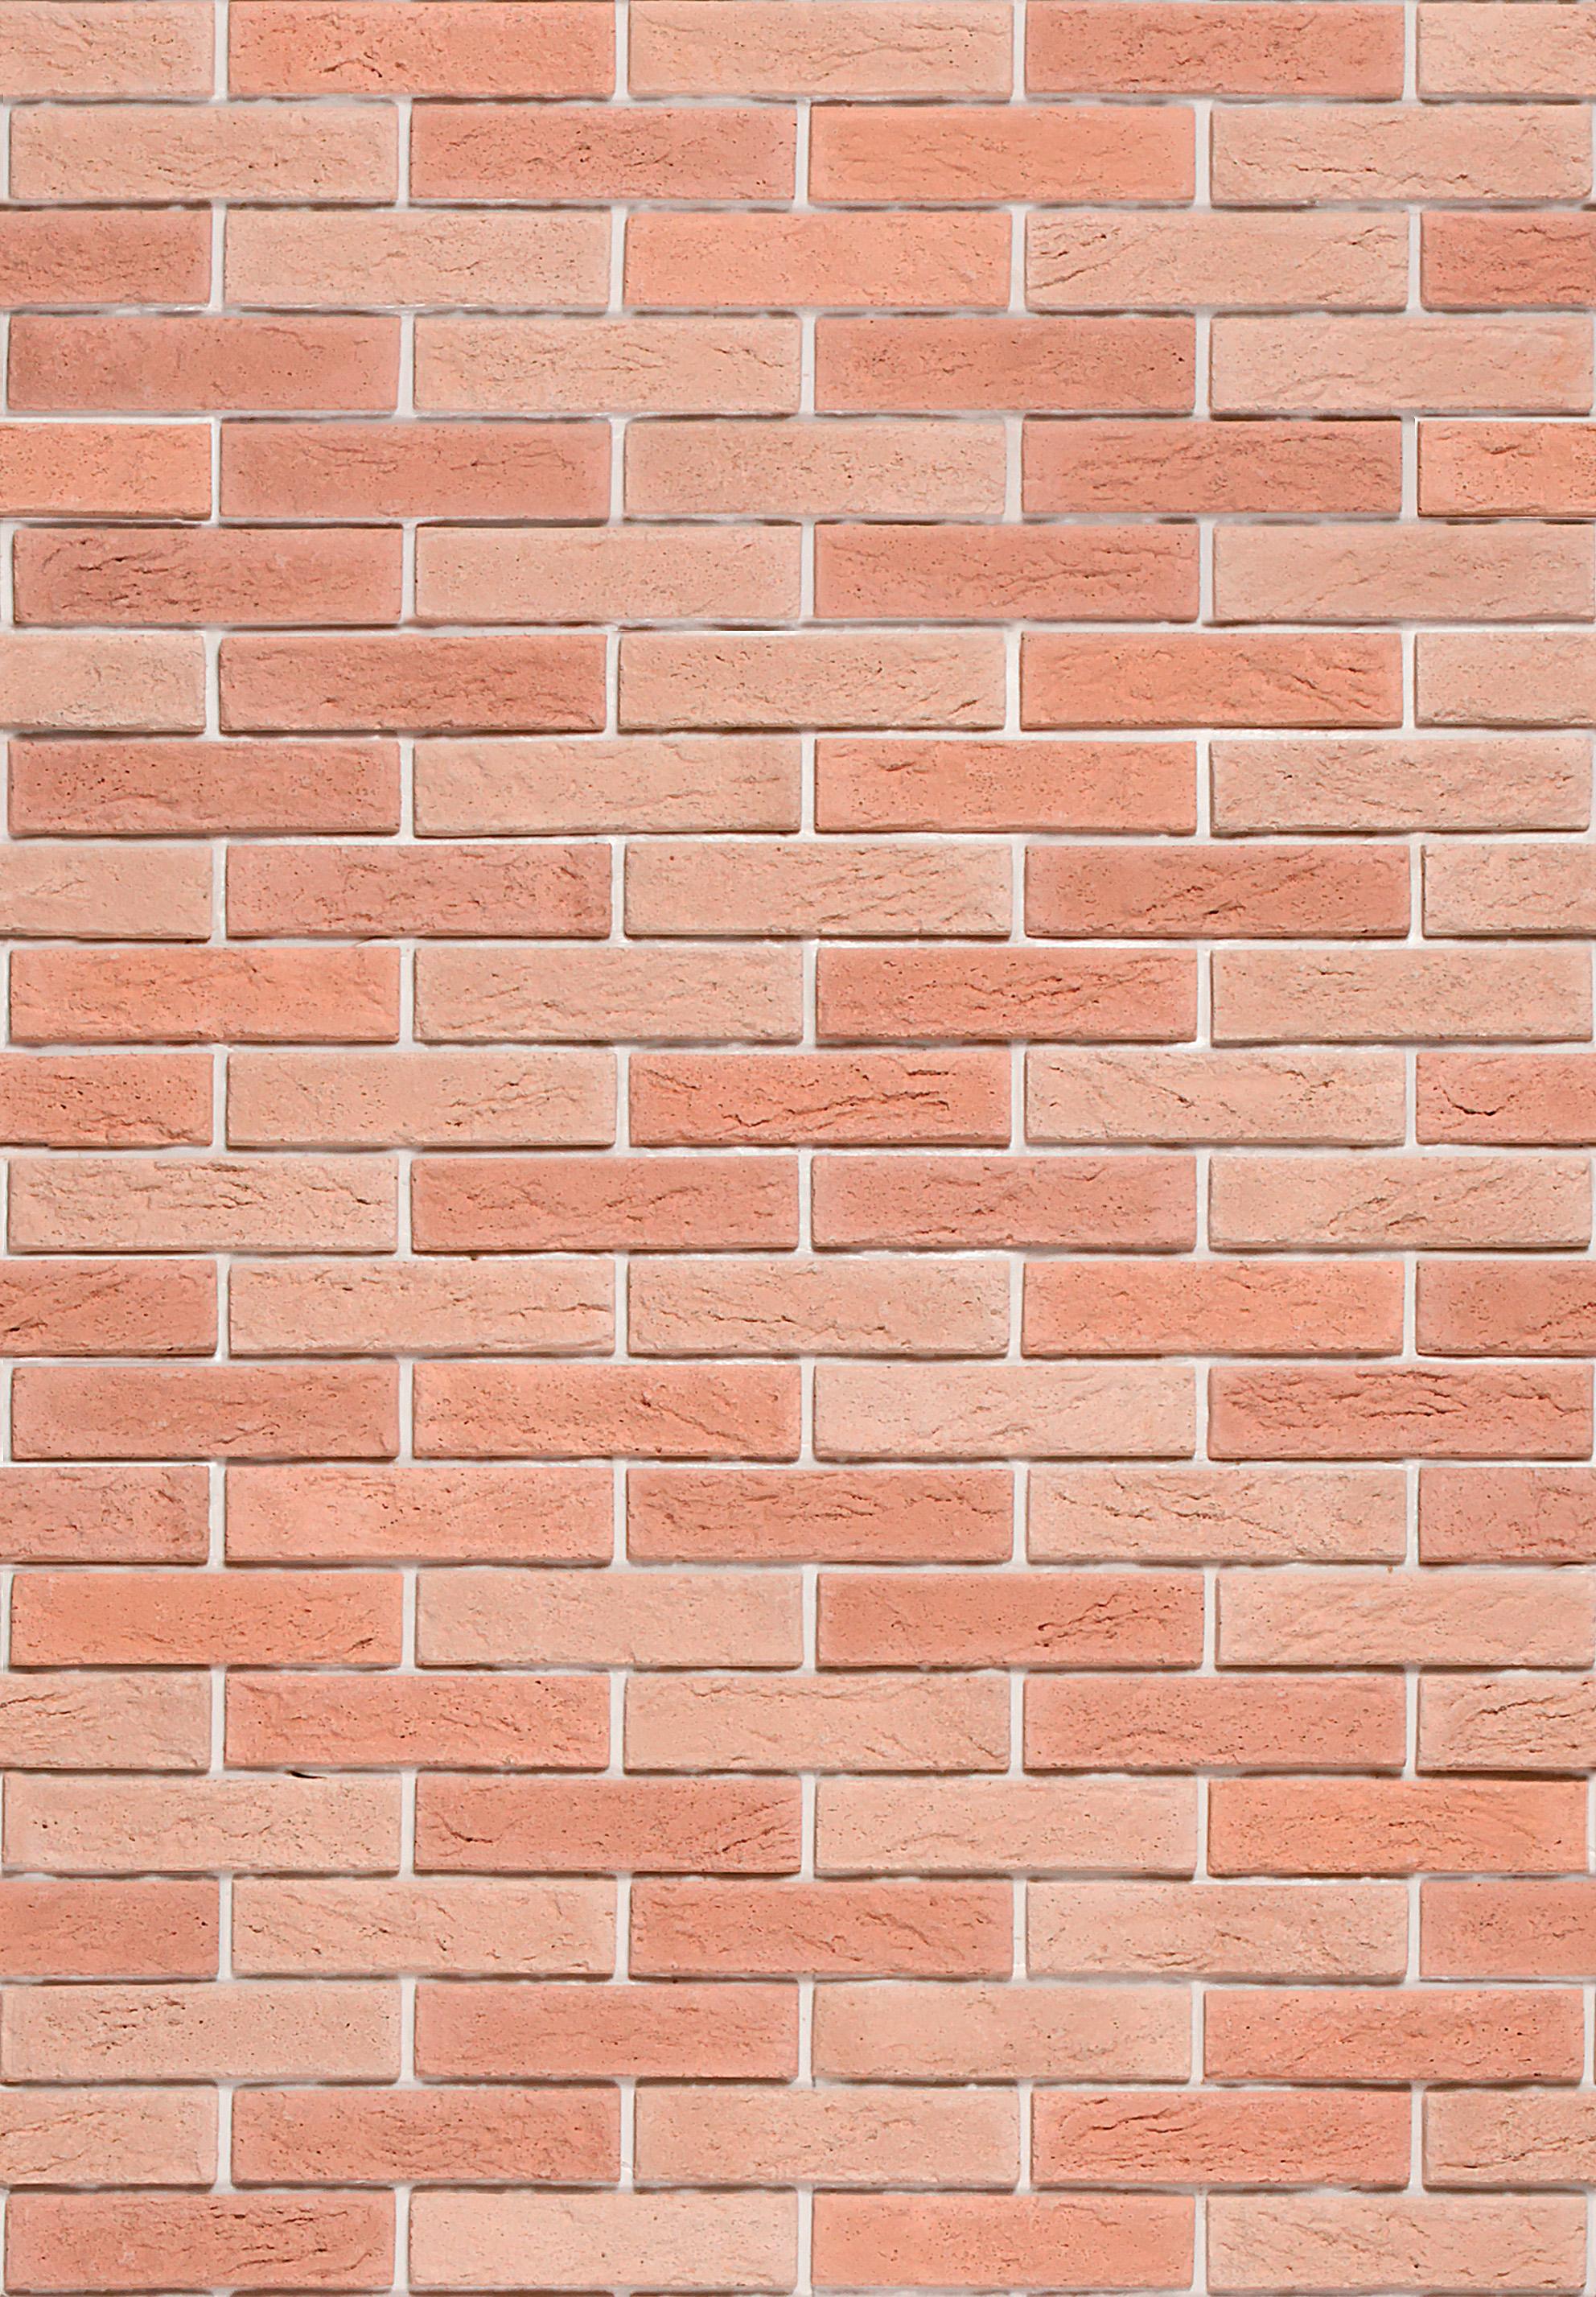 decorative brick, background, texture, download photo, brick texture